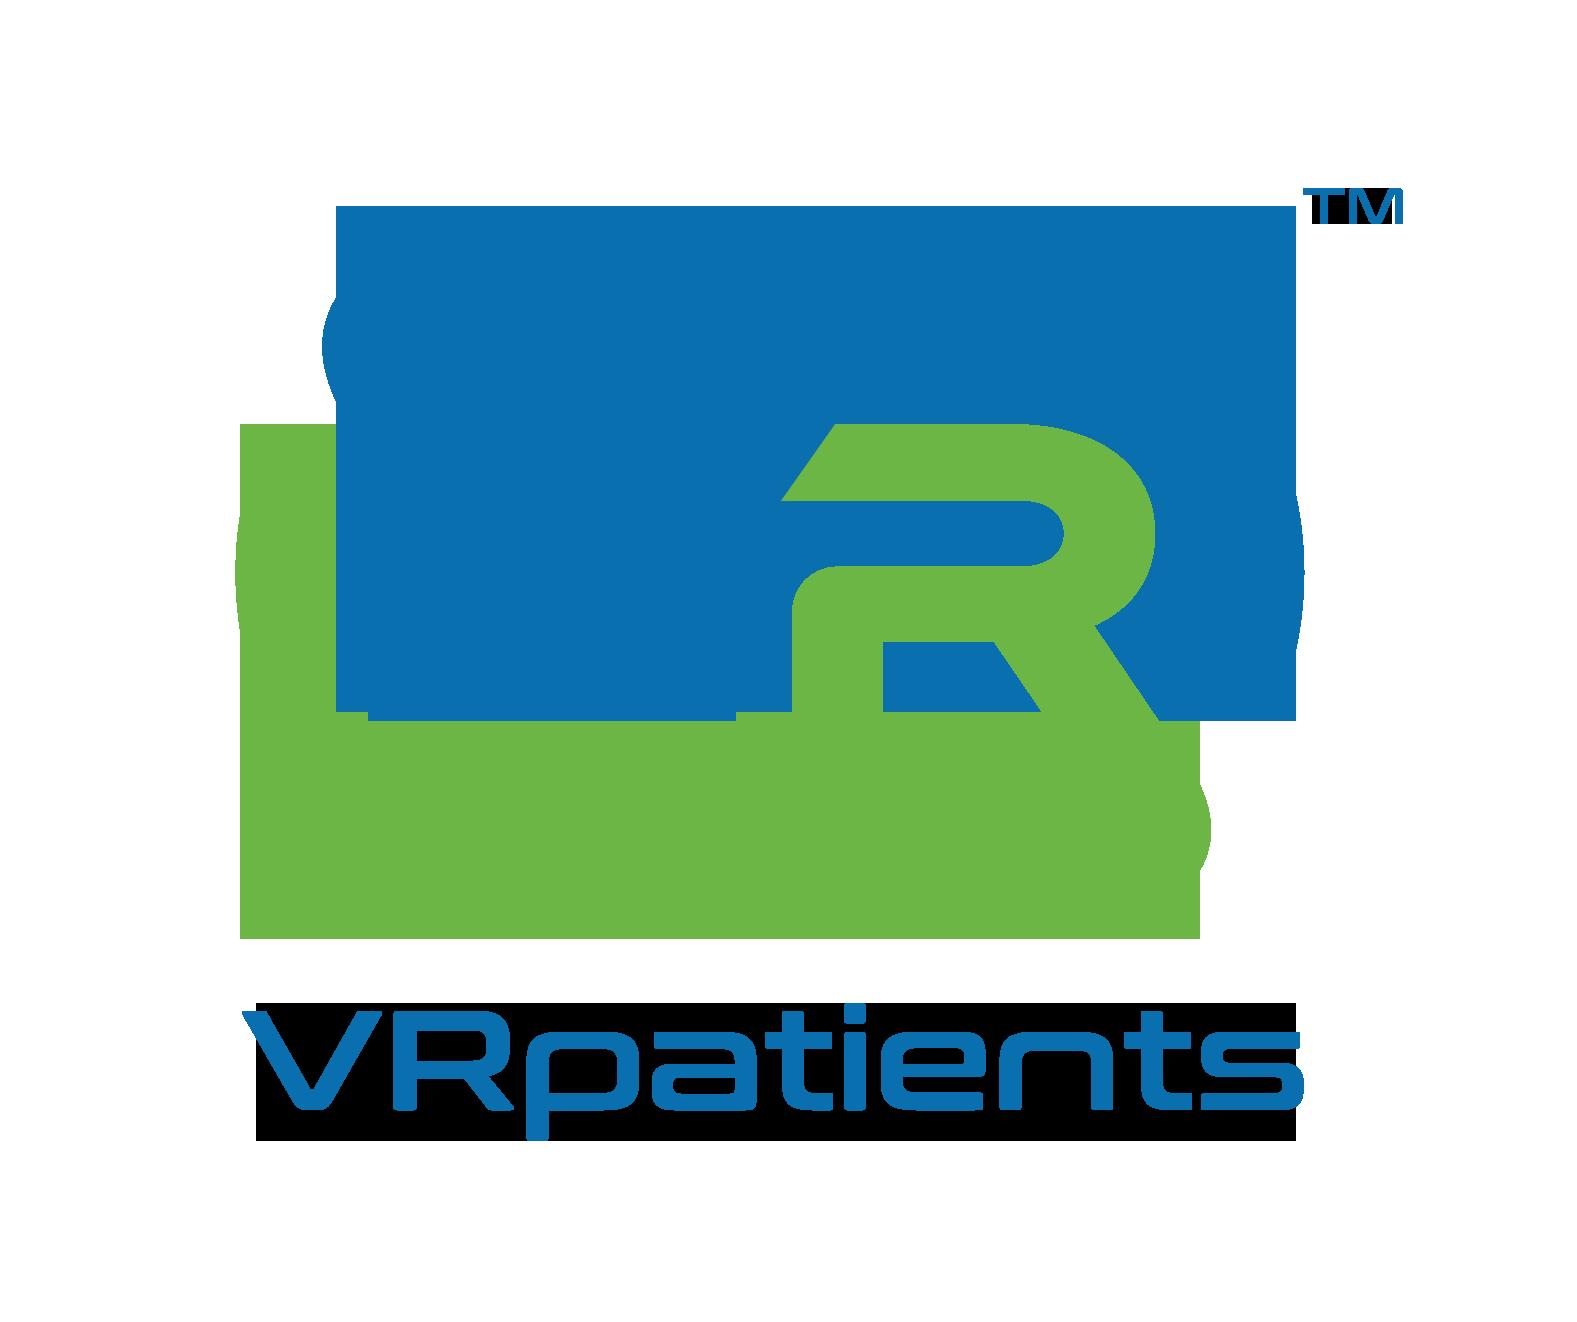 VRpatients